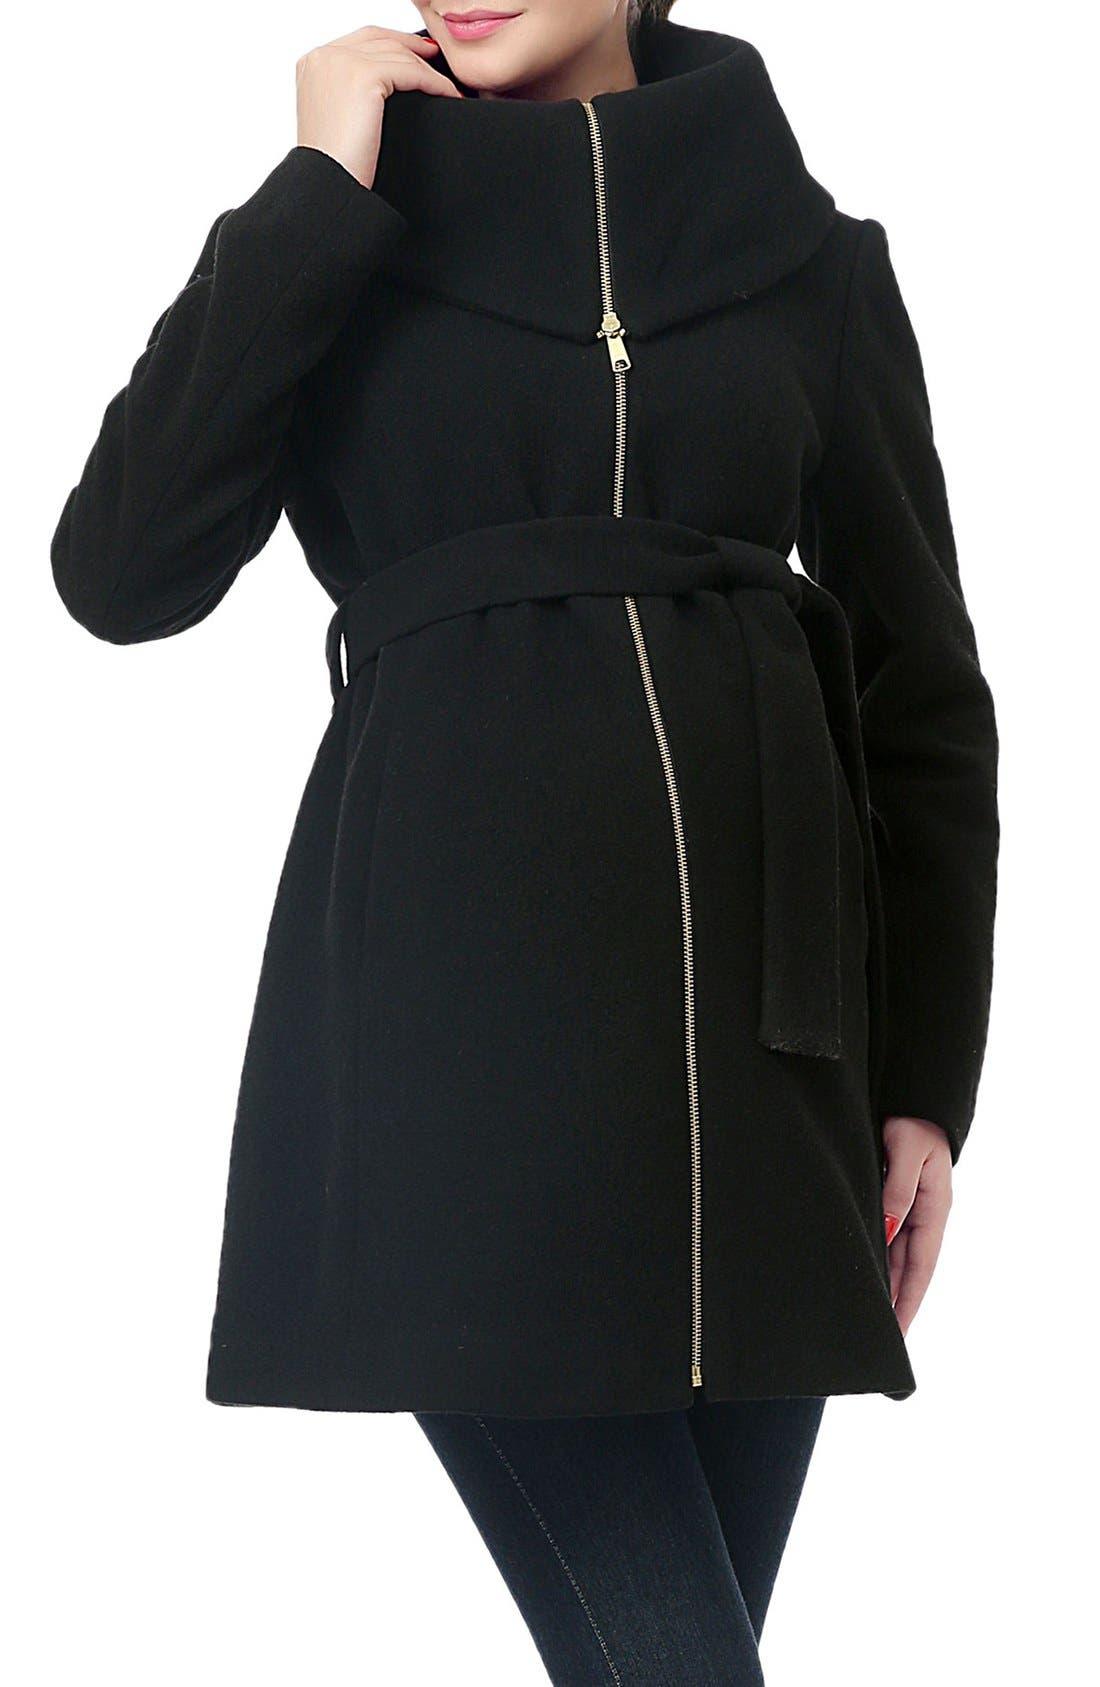 'Mia' High Collar Maternity Coat,                         Main,                         color, 001